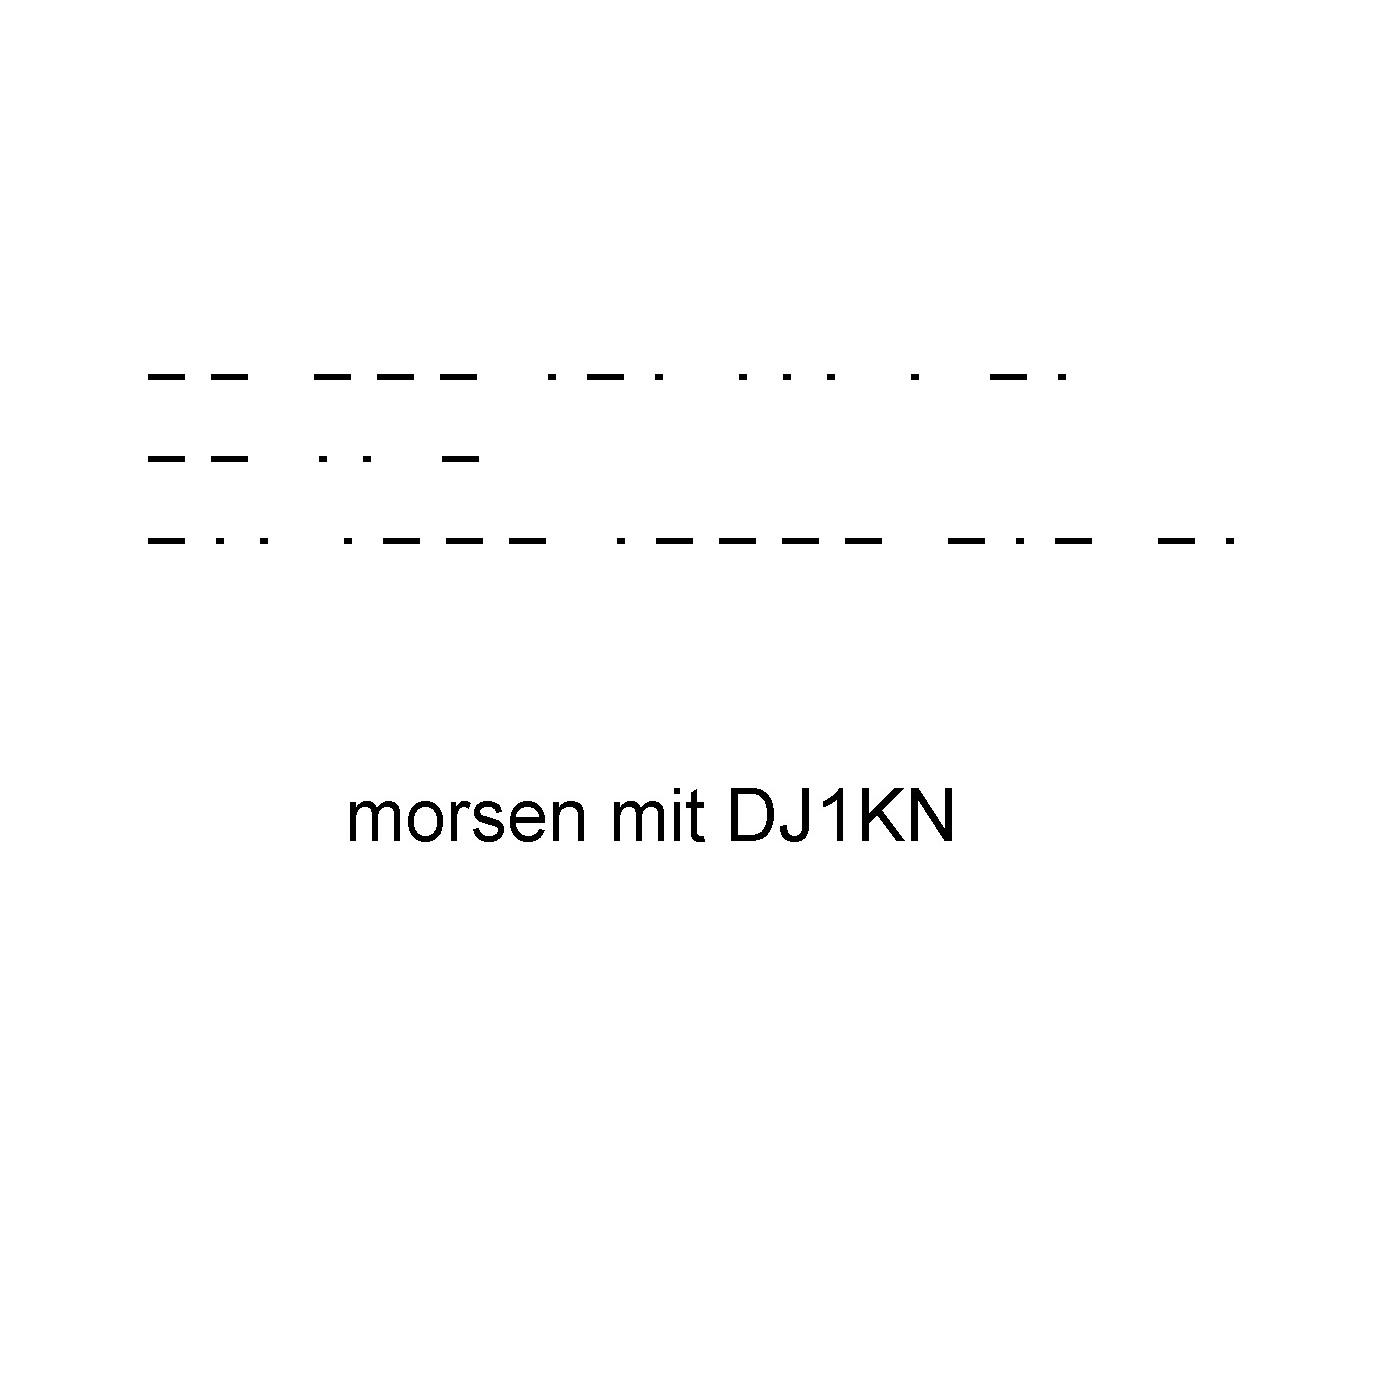 Morselehrgang von DJ1KN